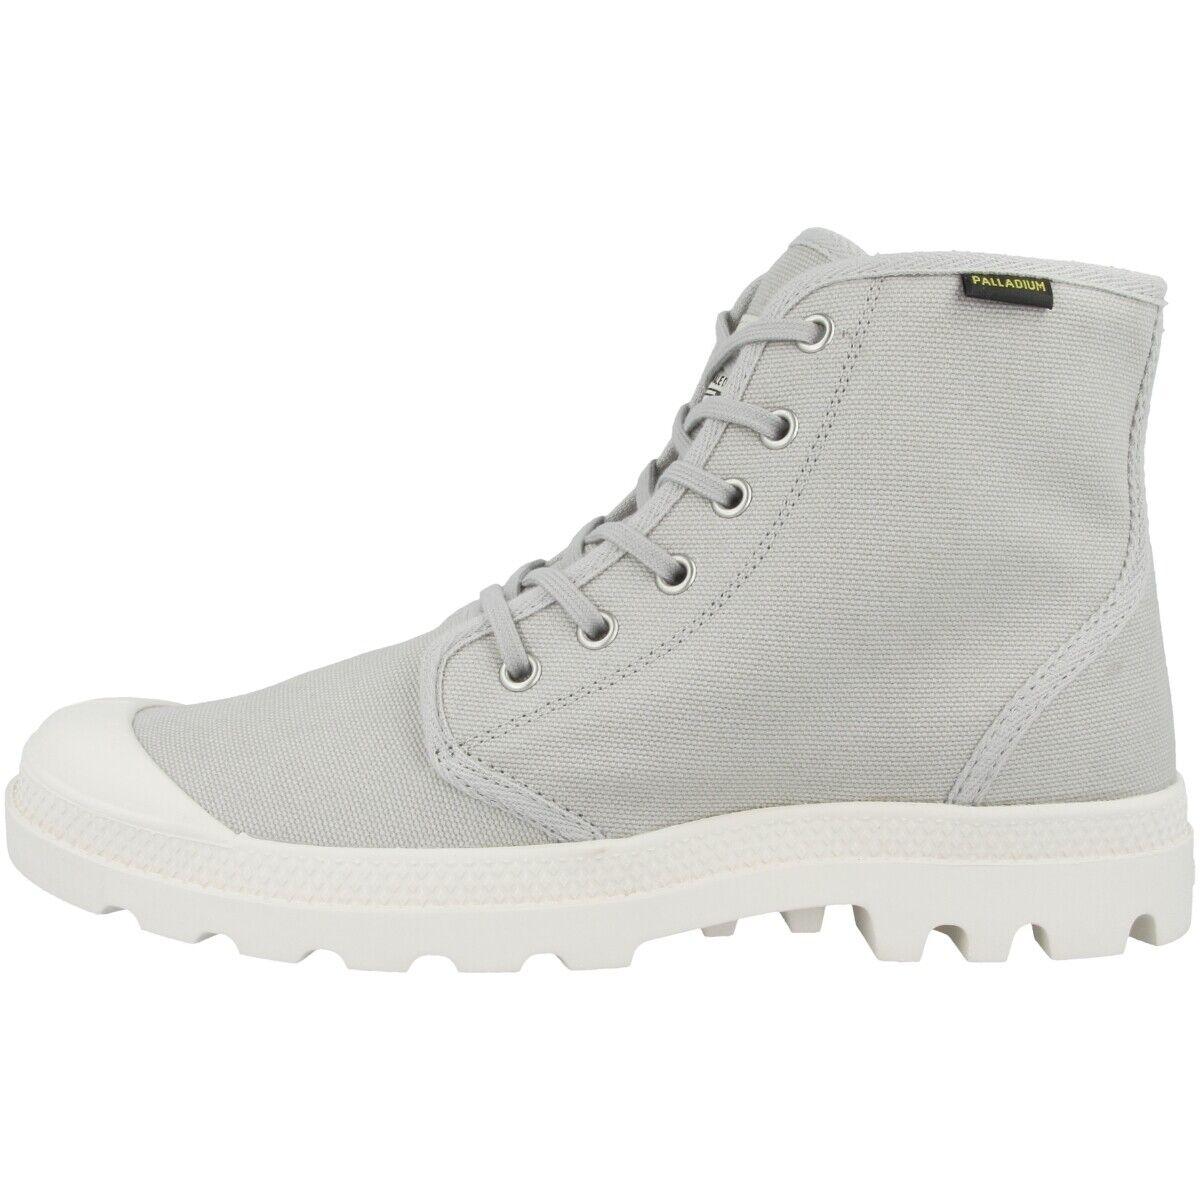 Palladium Pampa Hi Originale Stiefel Schuhe High Top Unisex Turnschuhe 75349-030